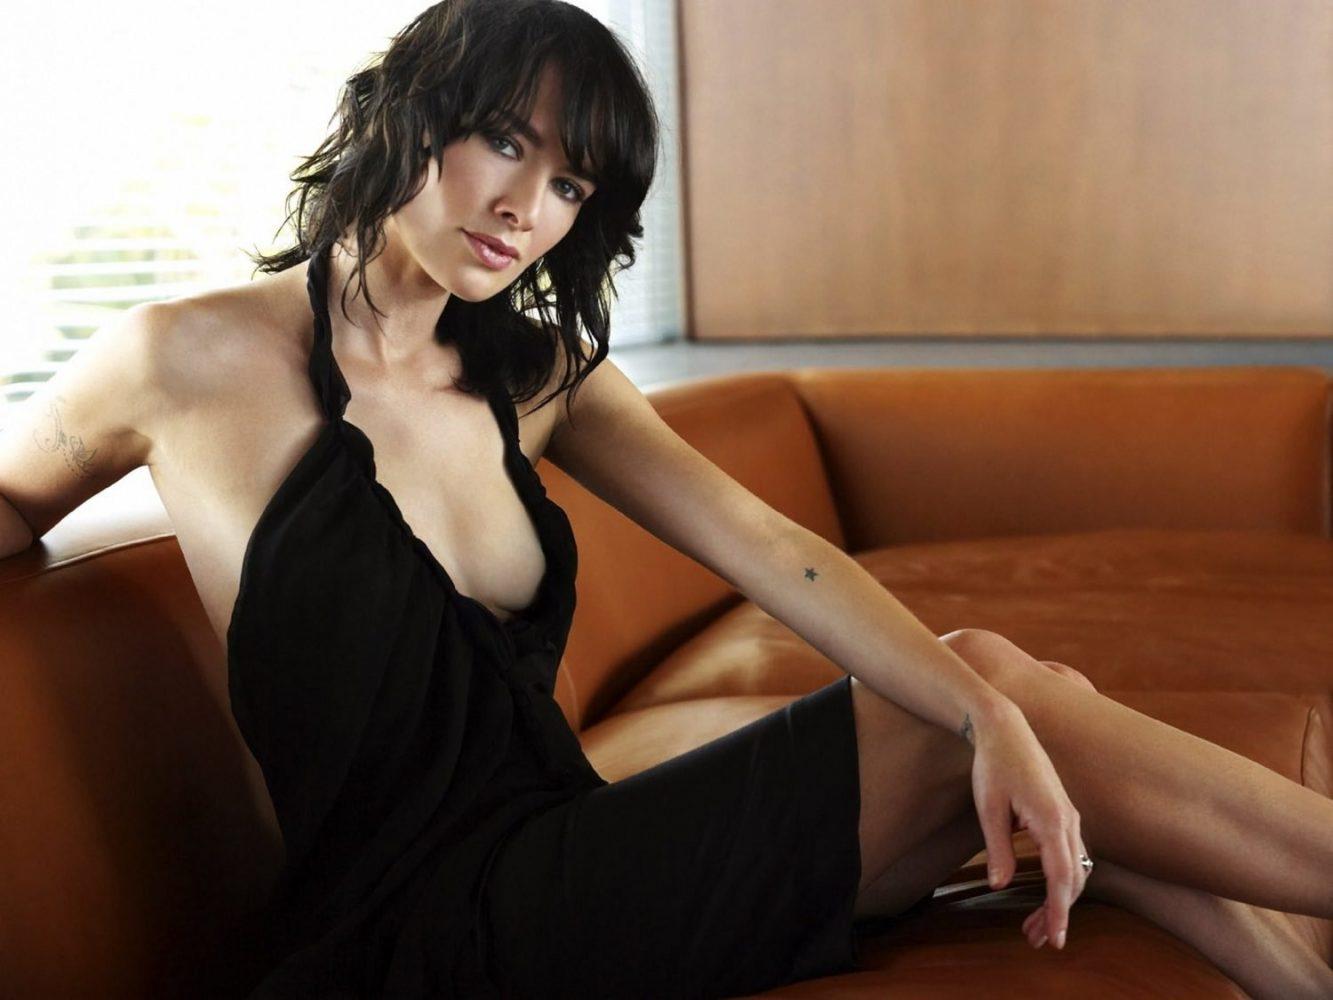 Lena Headey Hot Pictures